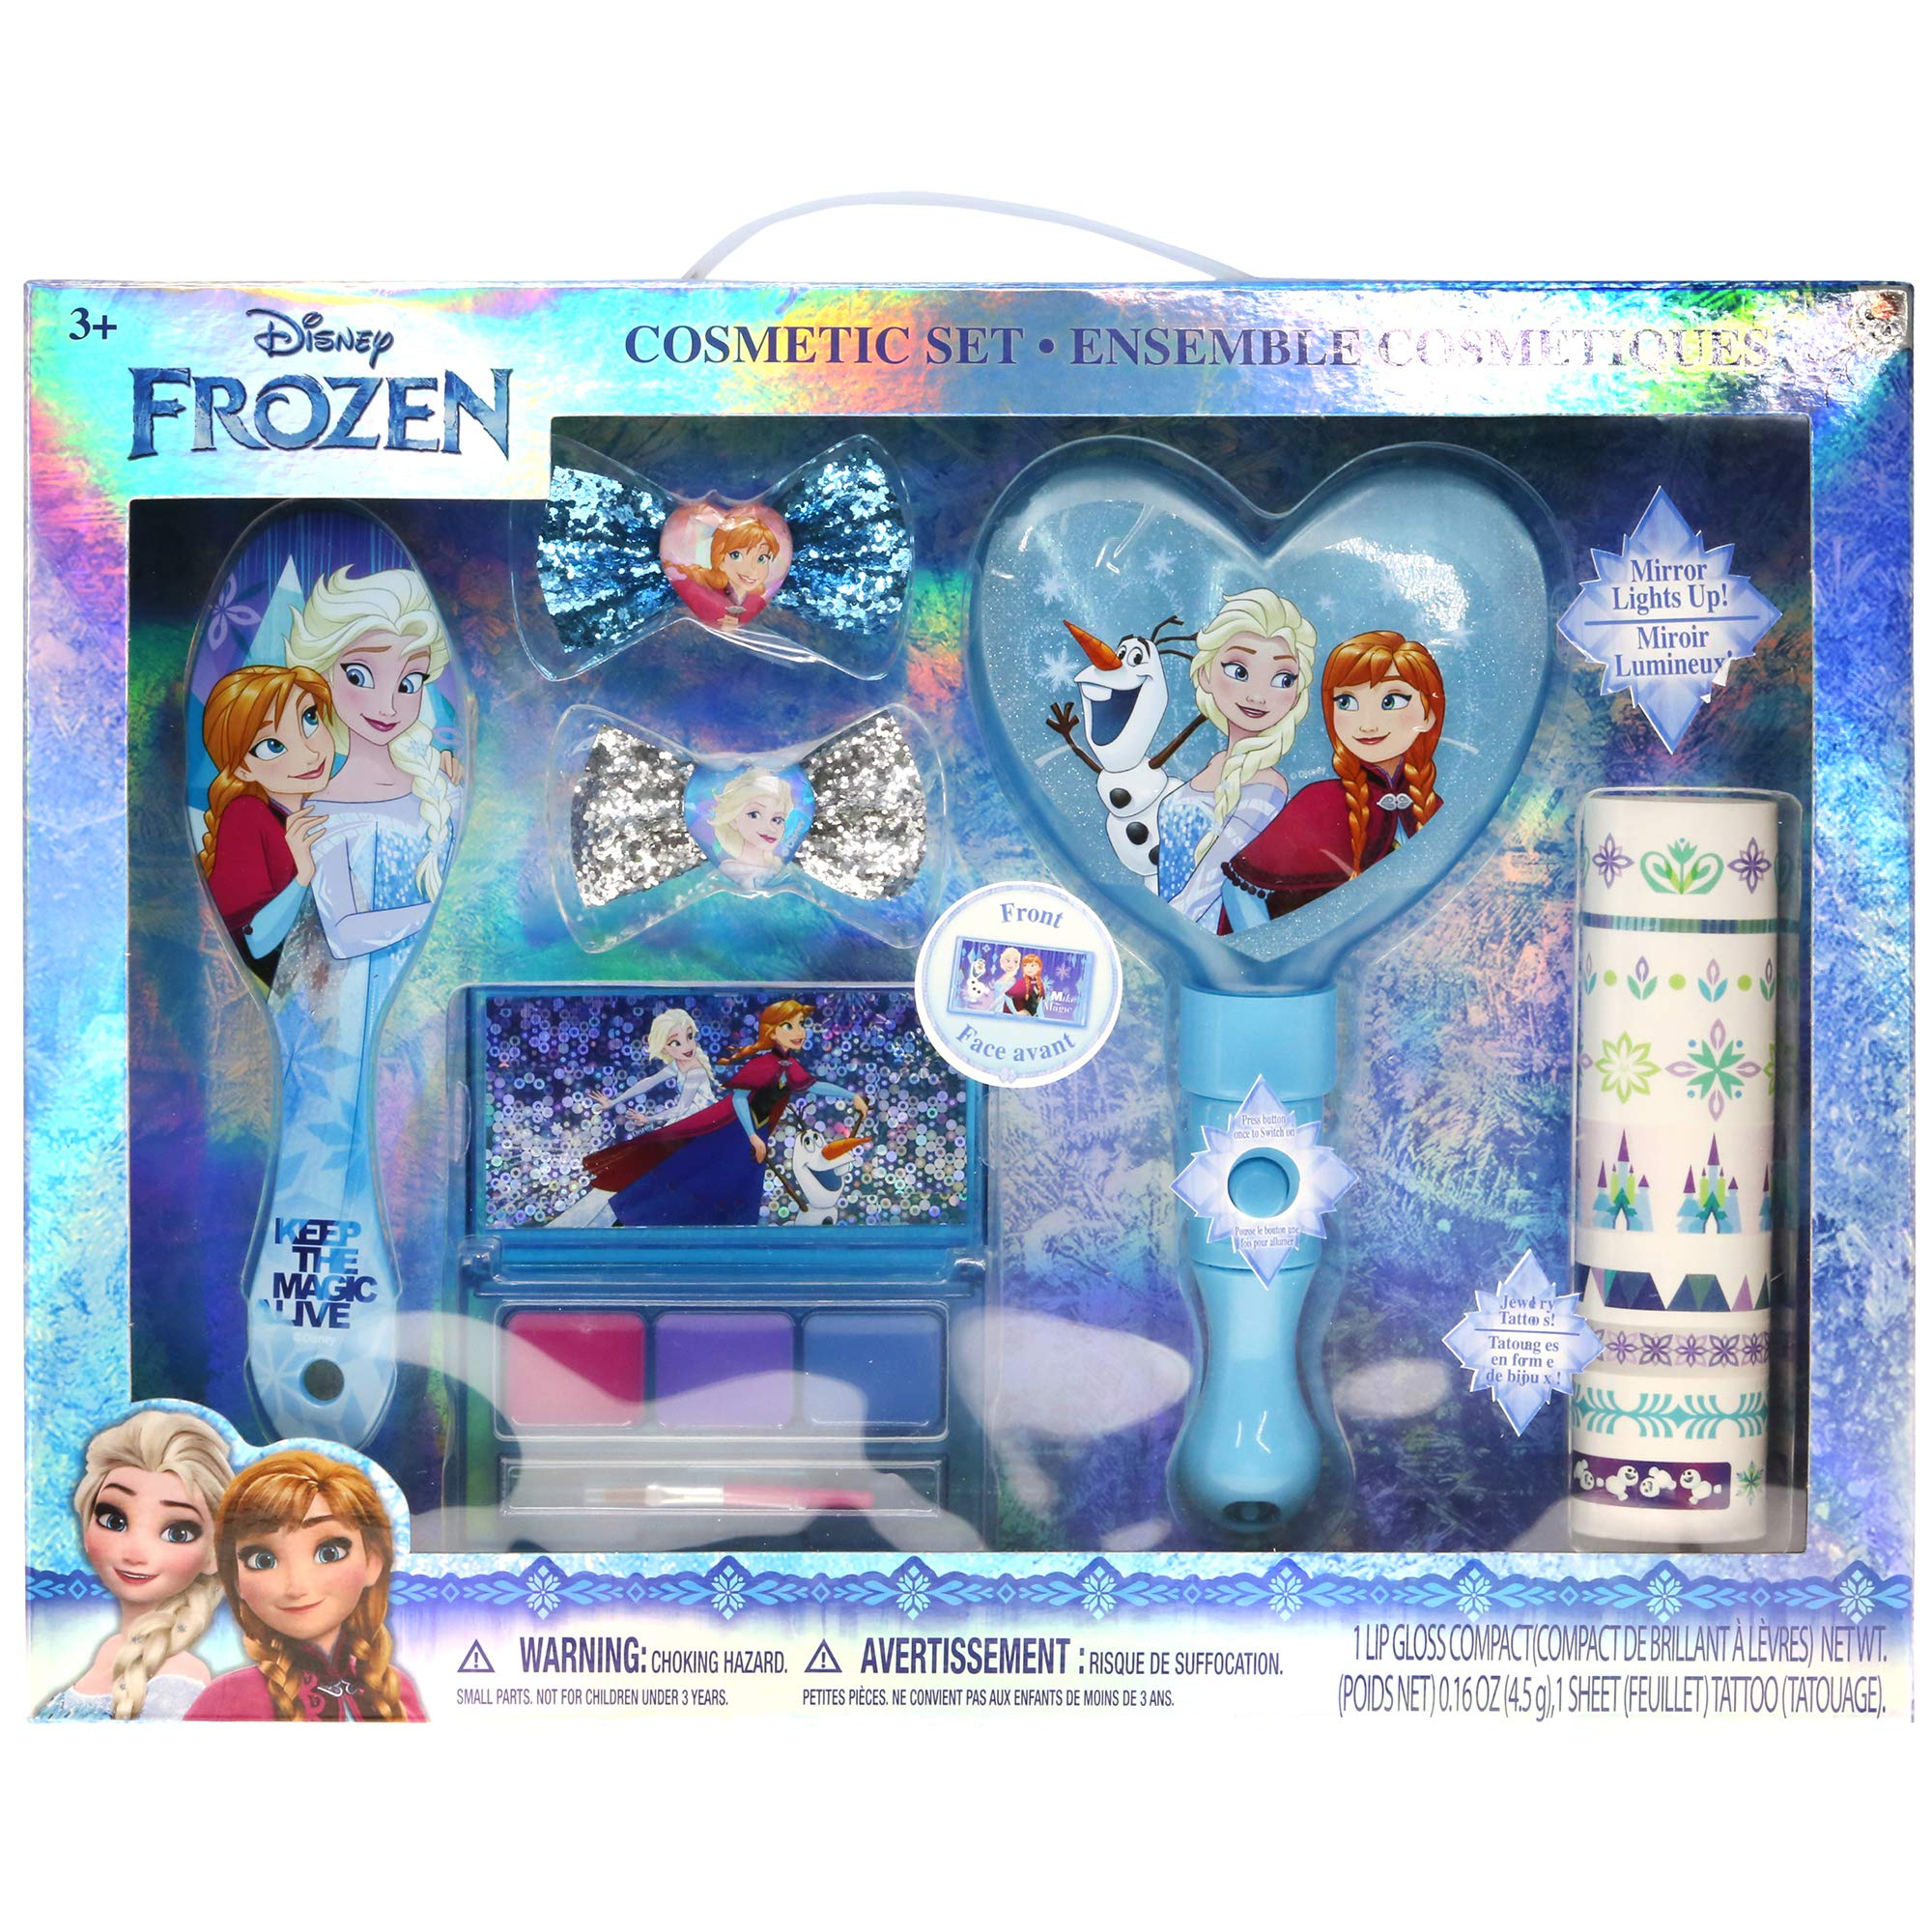 Townley Girl Disney Princess Non Toxic Peel Off Nail: Townley Girl Disney Frozen Beauty Kit, Lip Balms, Glosses